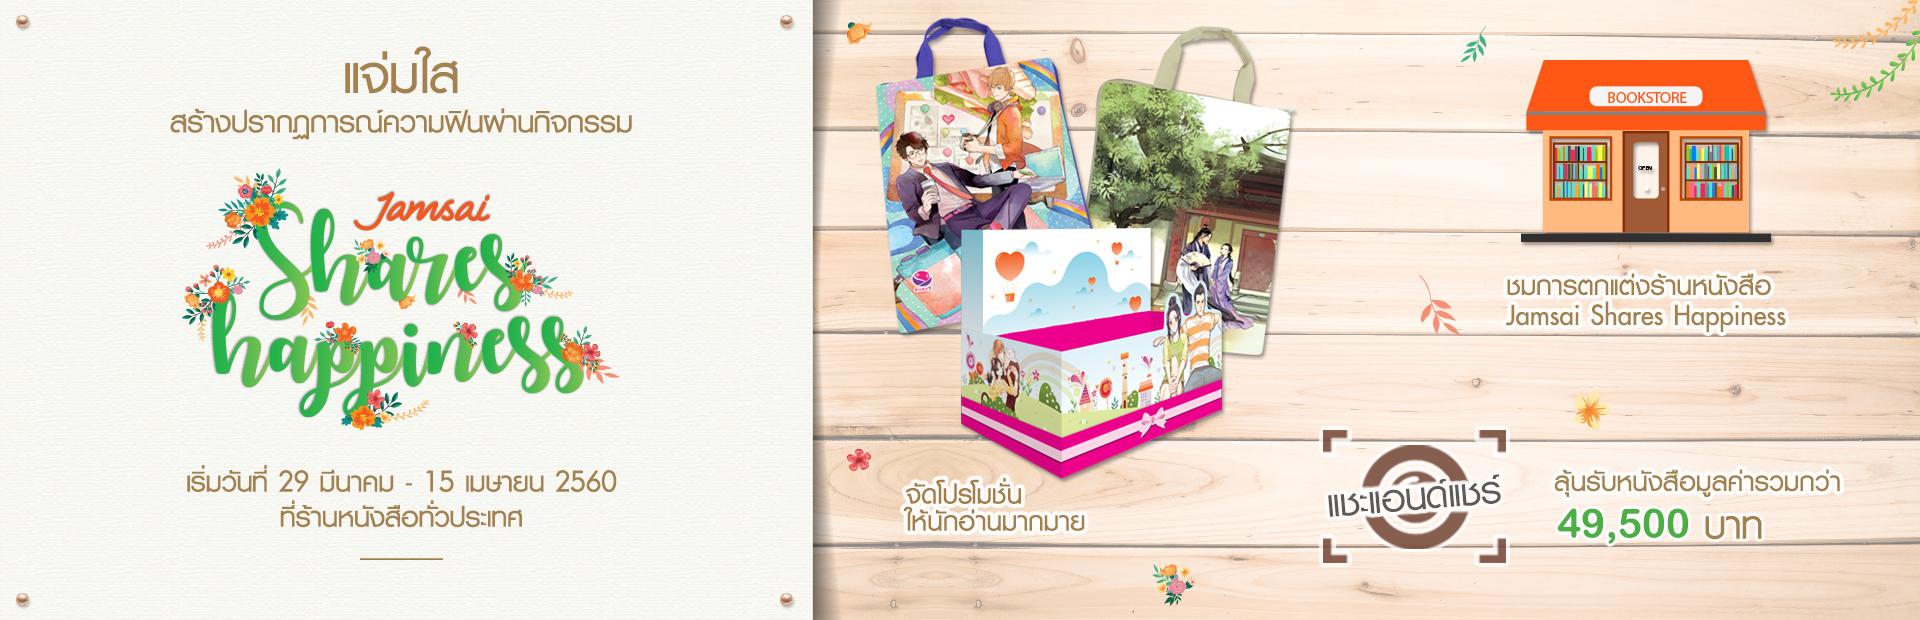 banner1290_jamsai-sharess-happniess